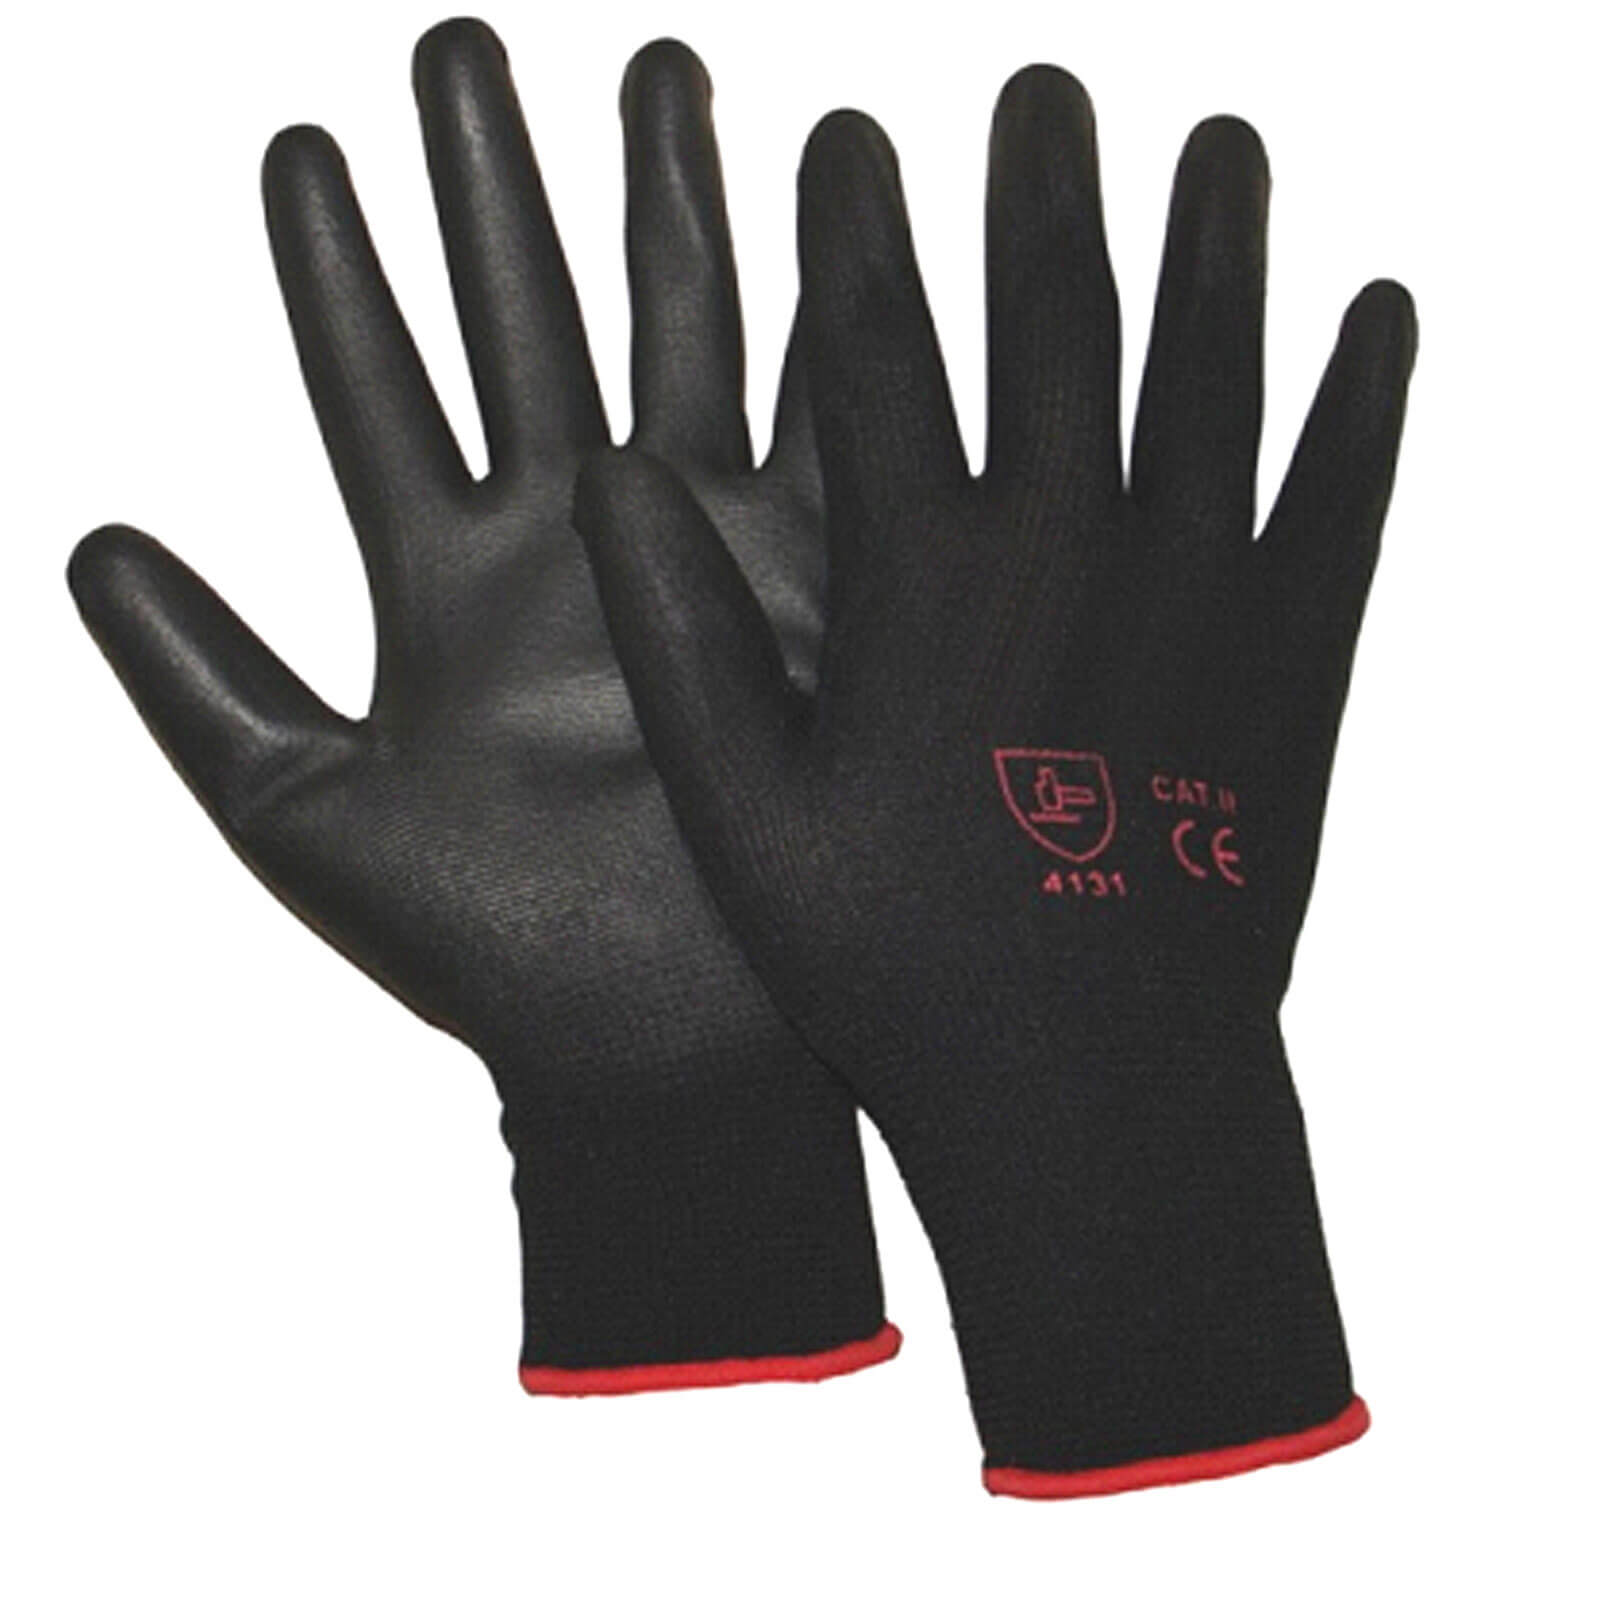 Tooled Up/Safety & Workwear/PPE/Handy Black Polyurethane Coated Knitted Gloves Large